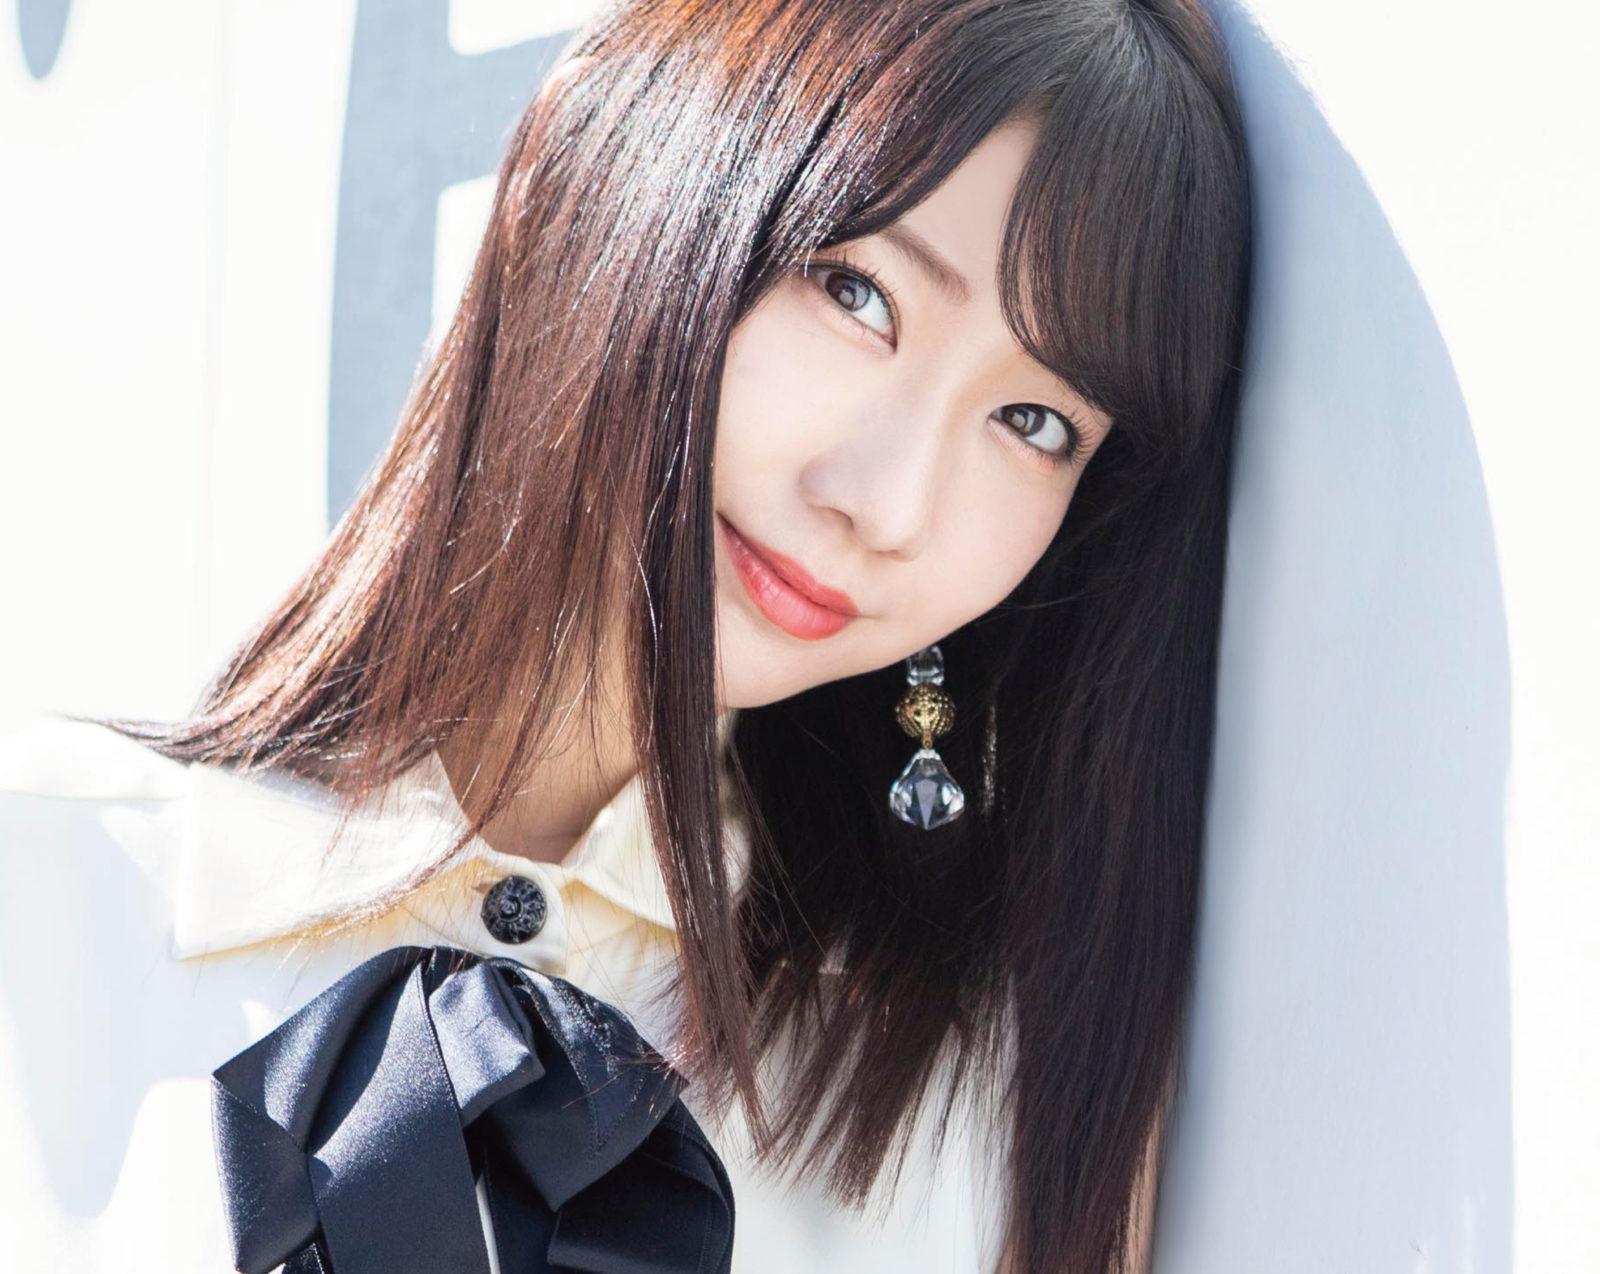 AKB48柏木由紀、グループ加入直後の指原莉乃は「めちゃめちゃ暗い子」